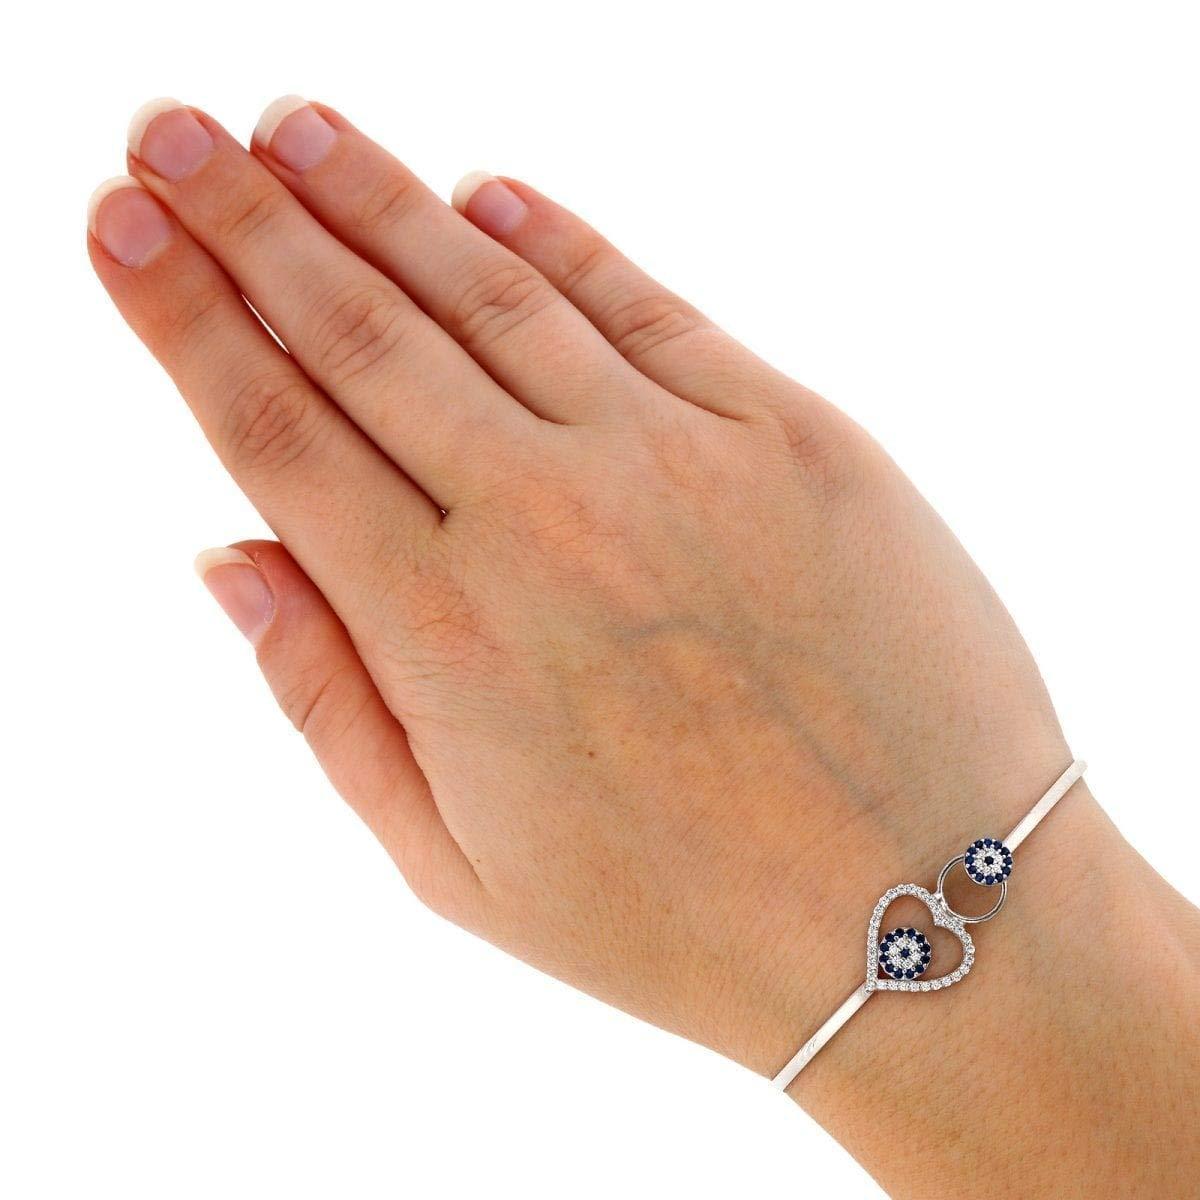 925 Sterling Silver CZ Heart Blue Evil Eye Bangle Bracelet 6.75